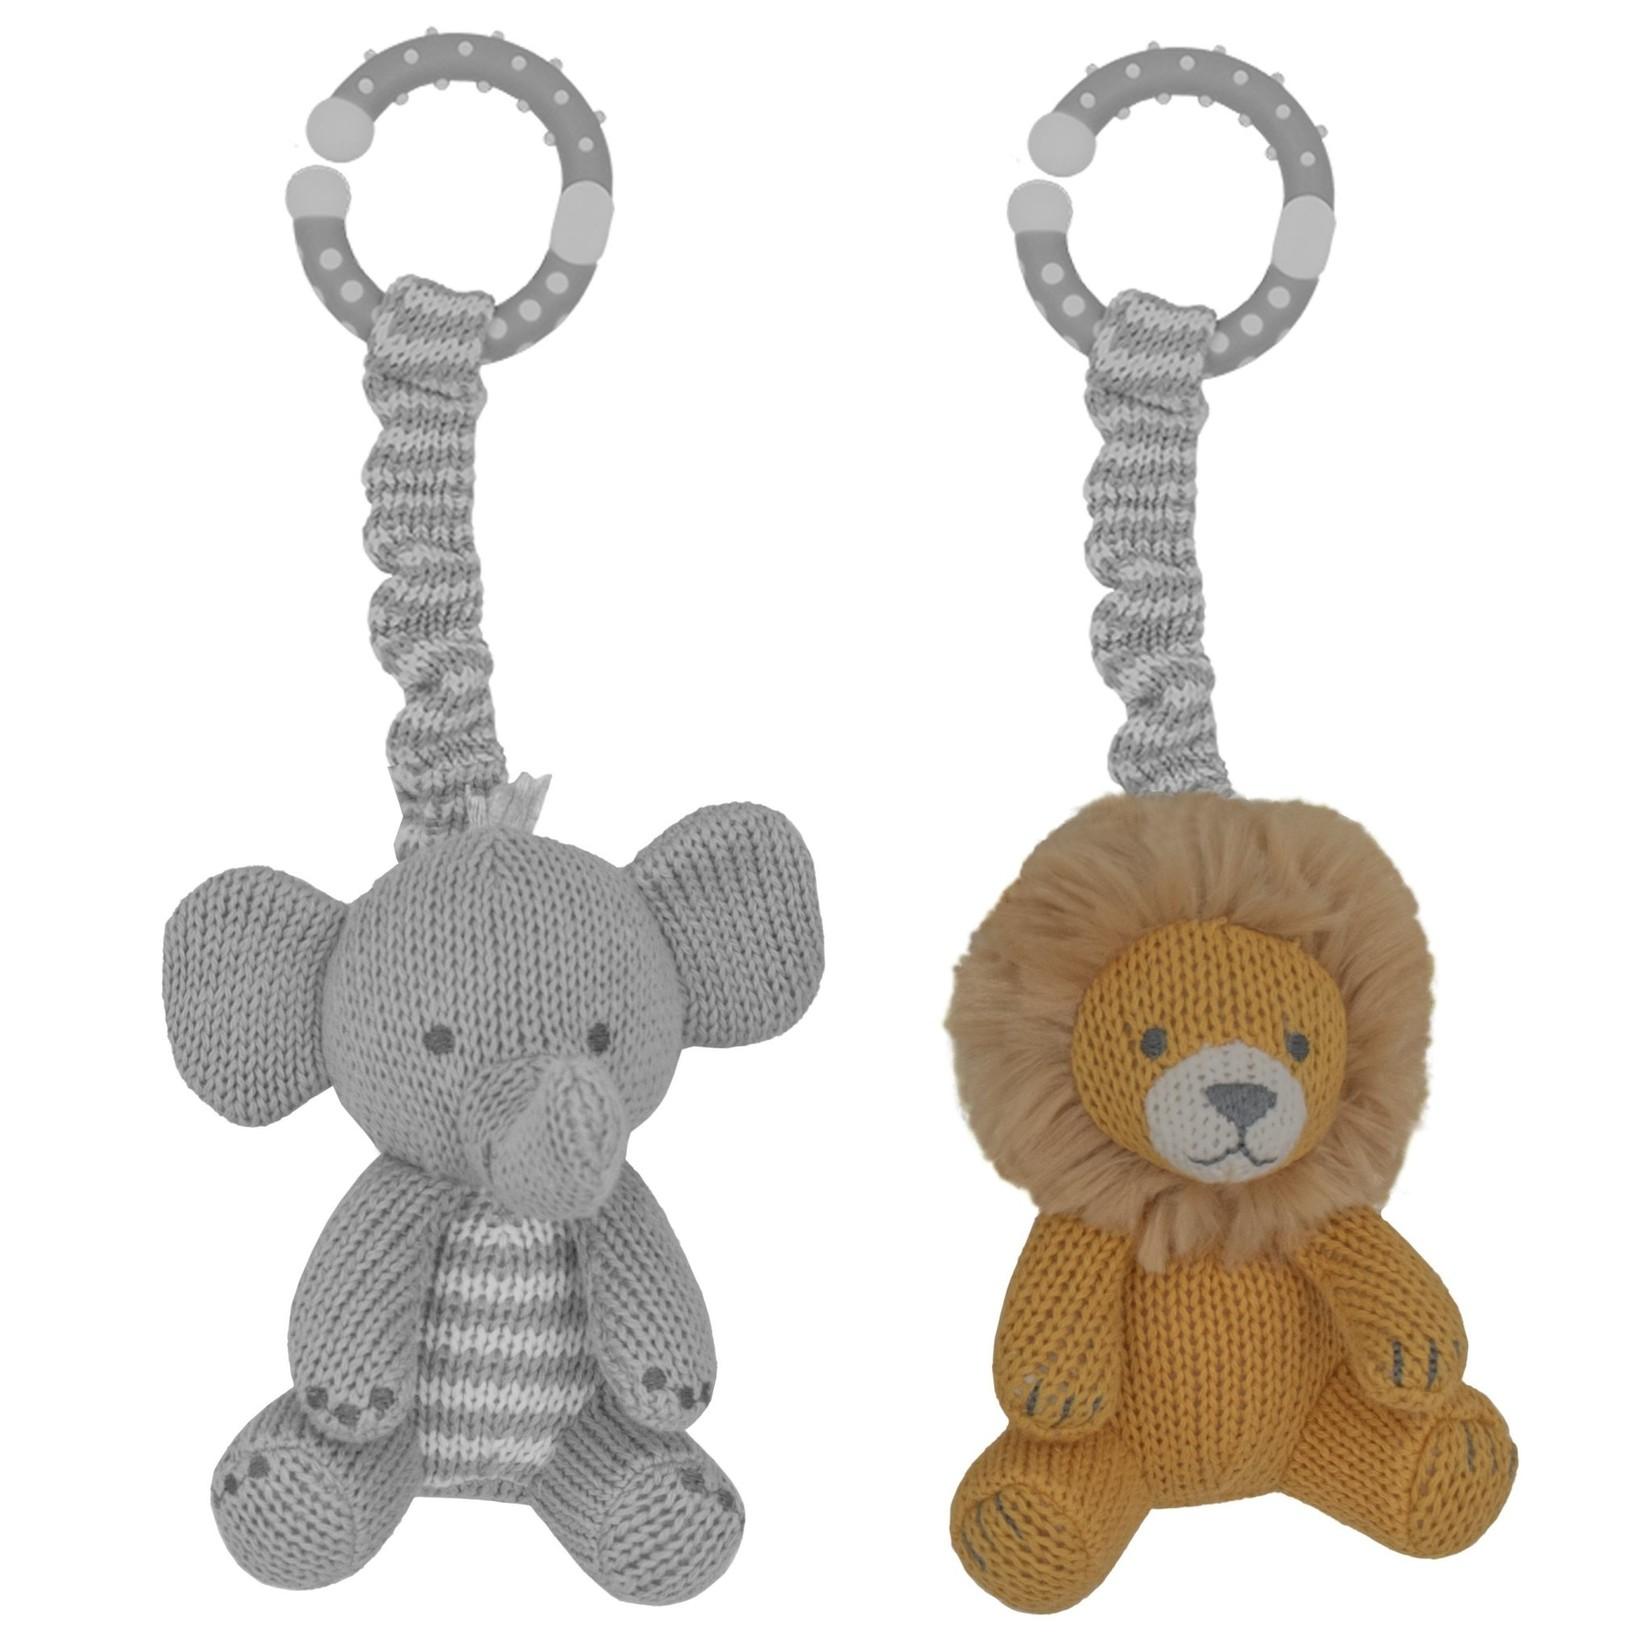 Lively Living Living Textiles 2pk Stroller Toy - Lion & Elephant